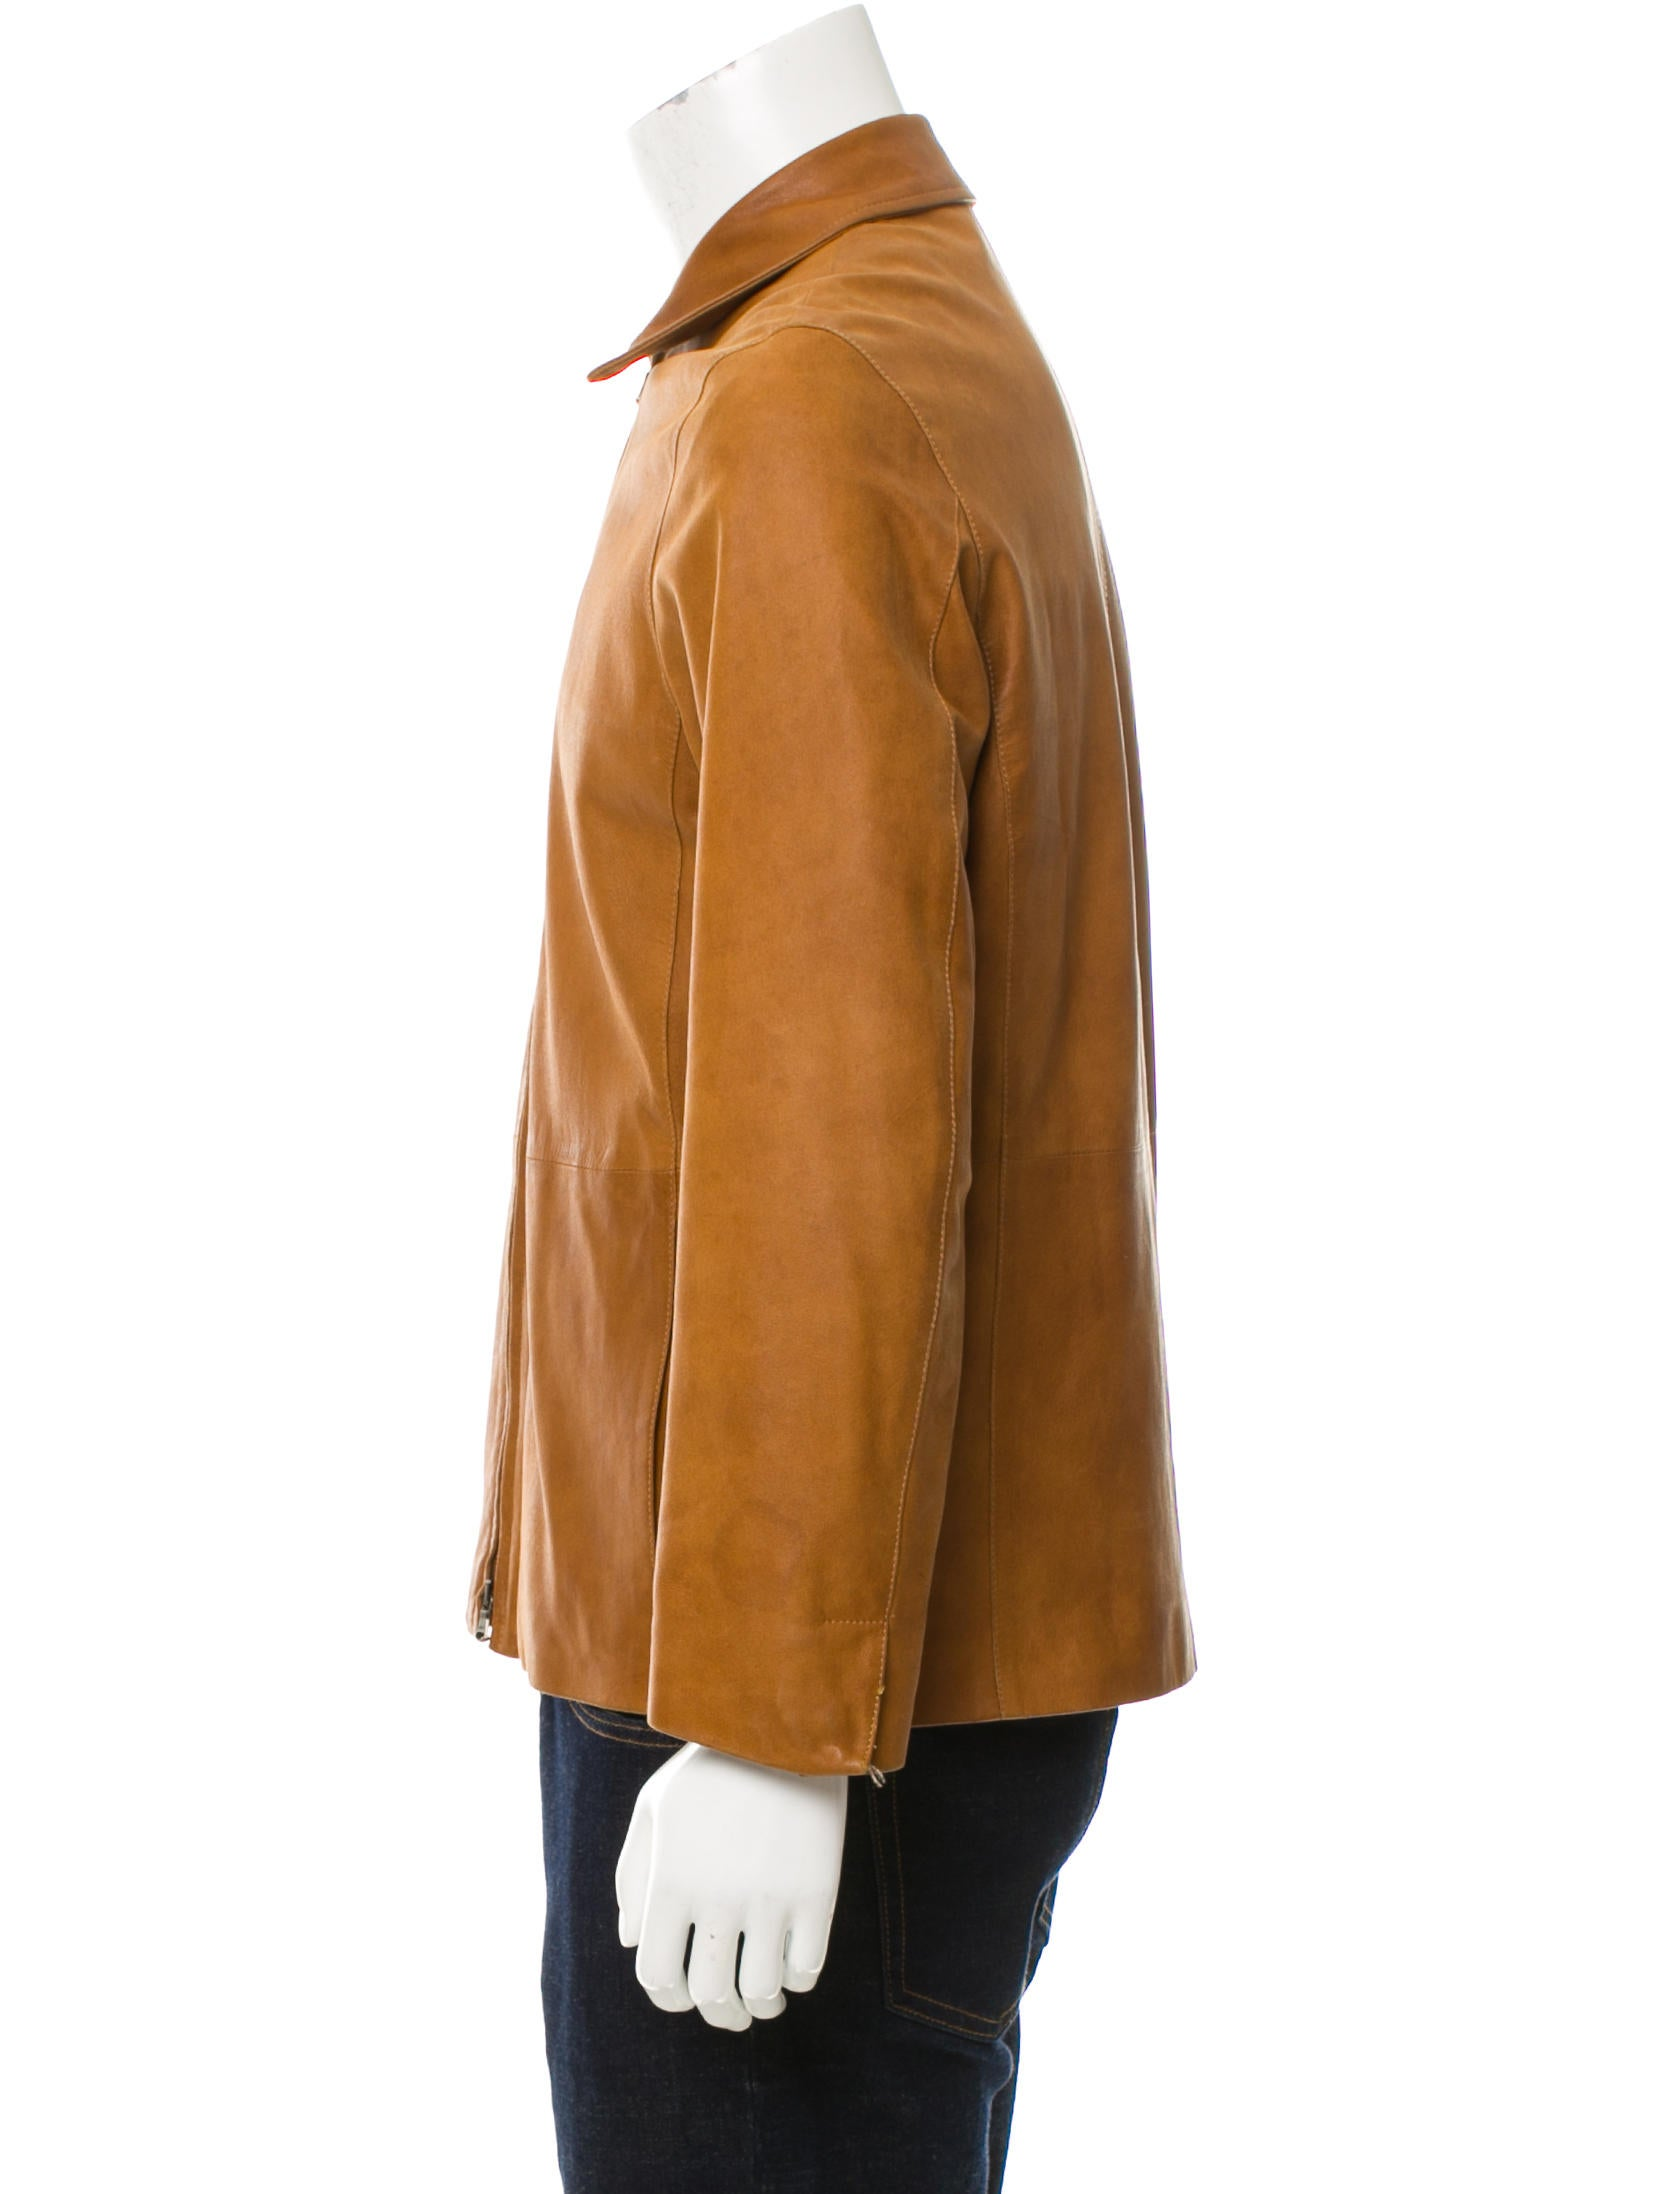 Bruno magli leather jacket